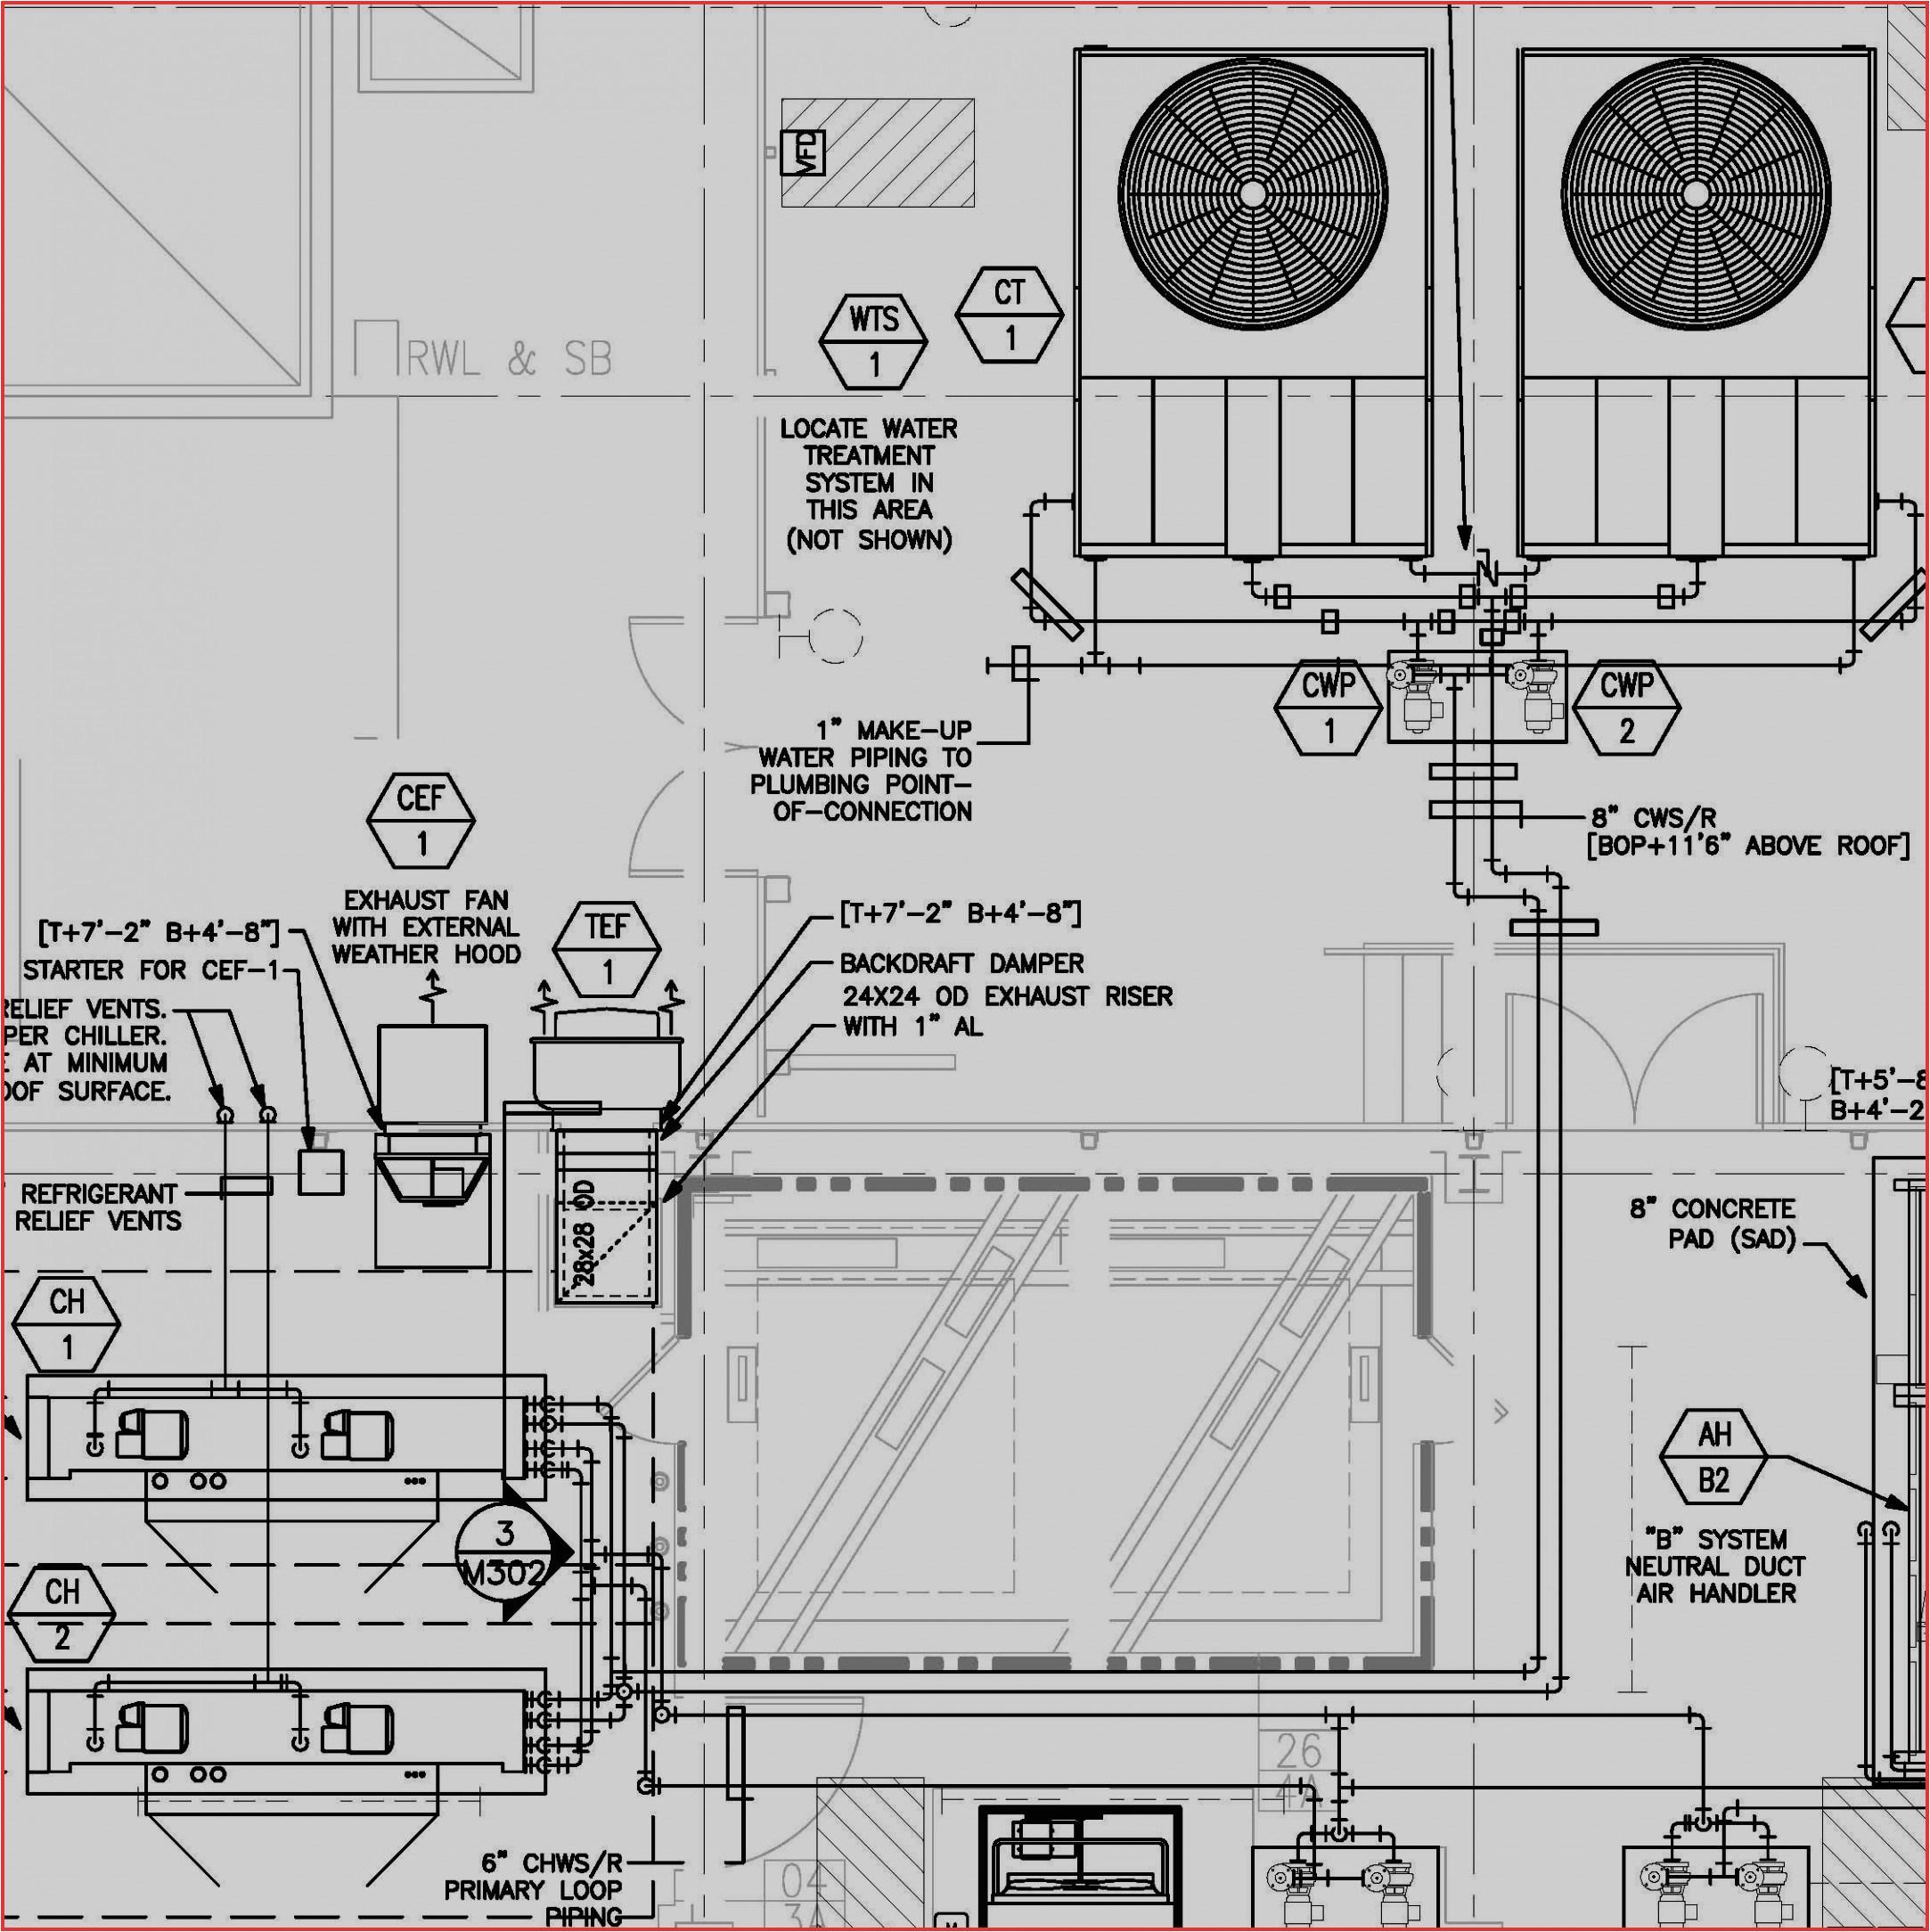 Panasonic Cq Cx160u Wiring Diagram Panasonic Wiring Diagrams Wiring Diagram Database